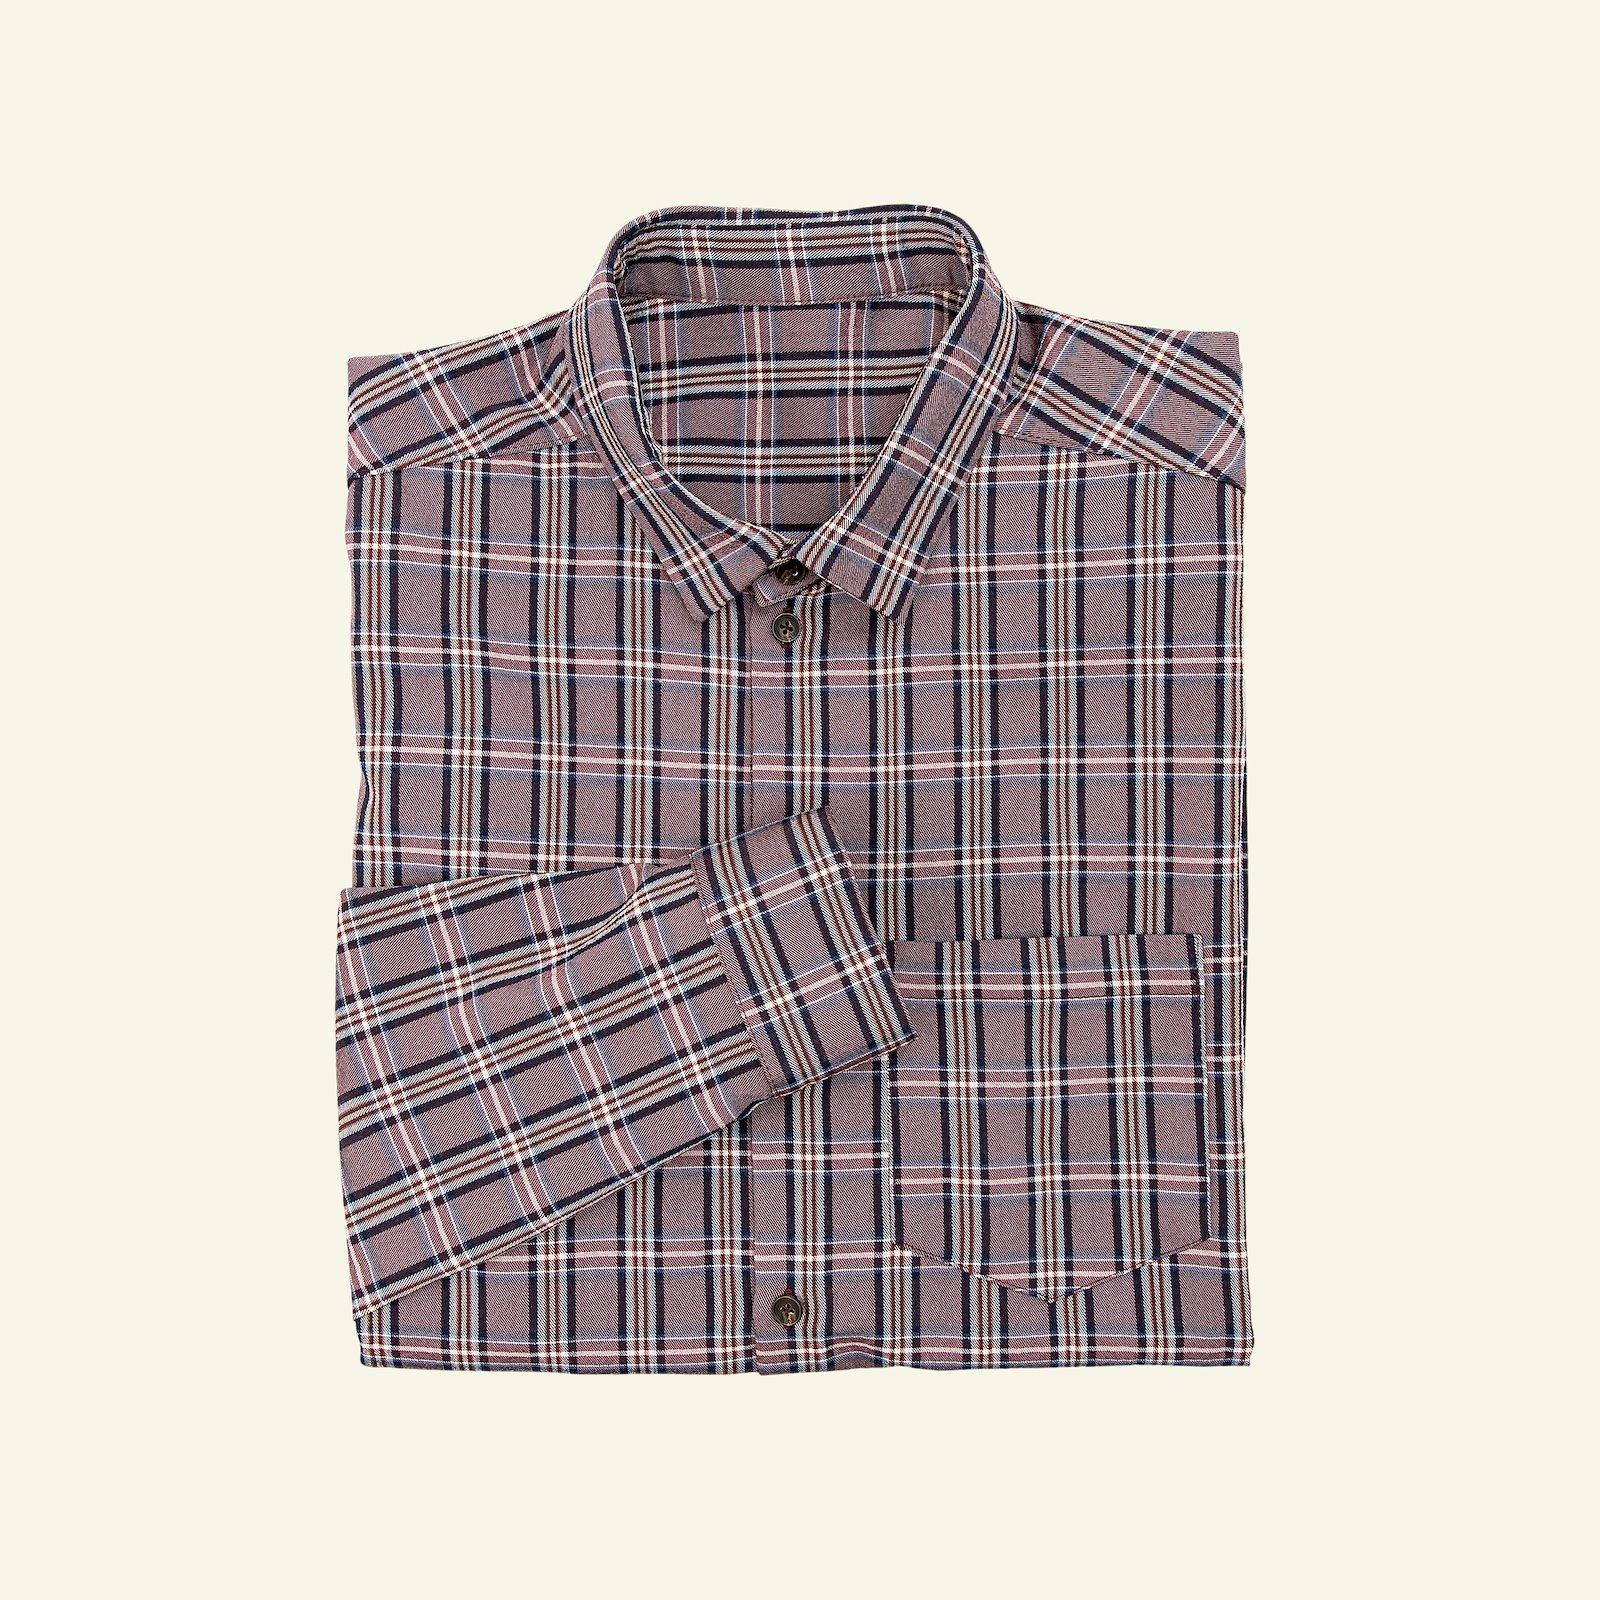 Shirt, M p87001_300219_40332_sskit